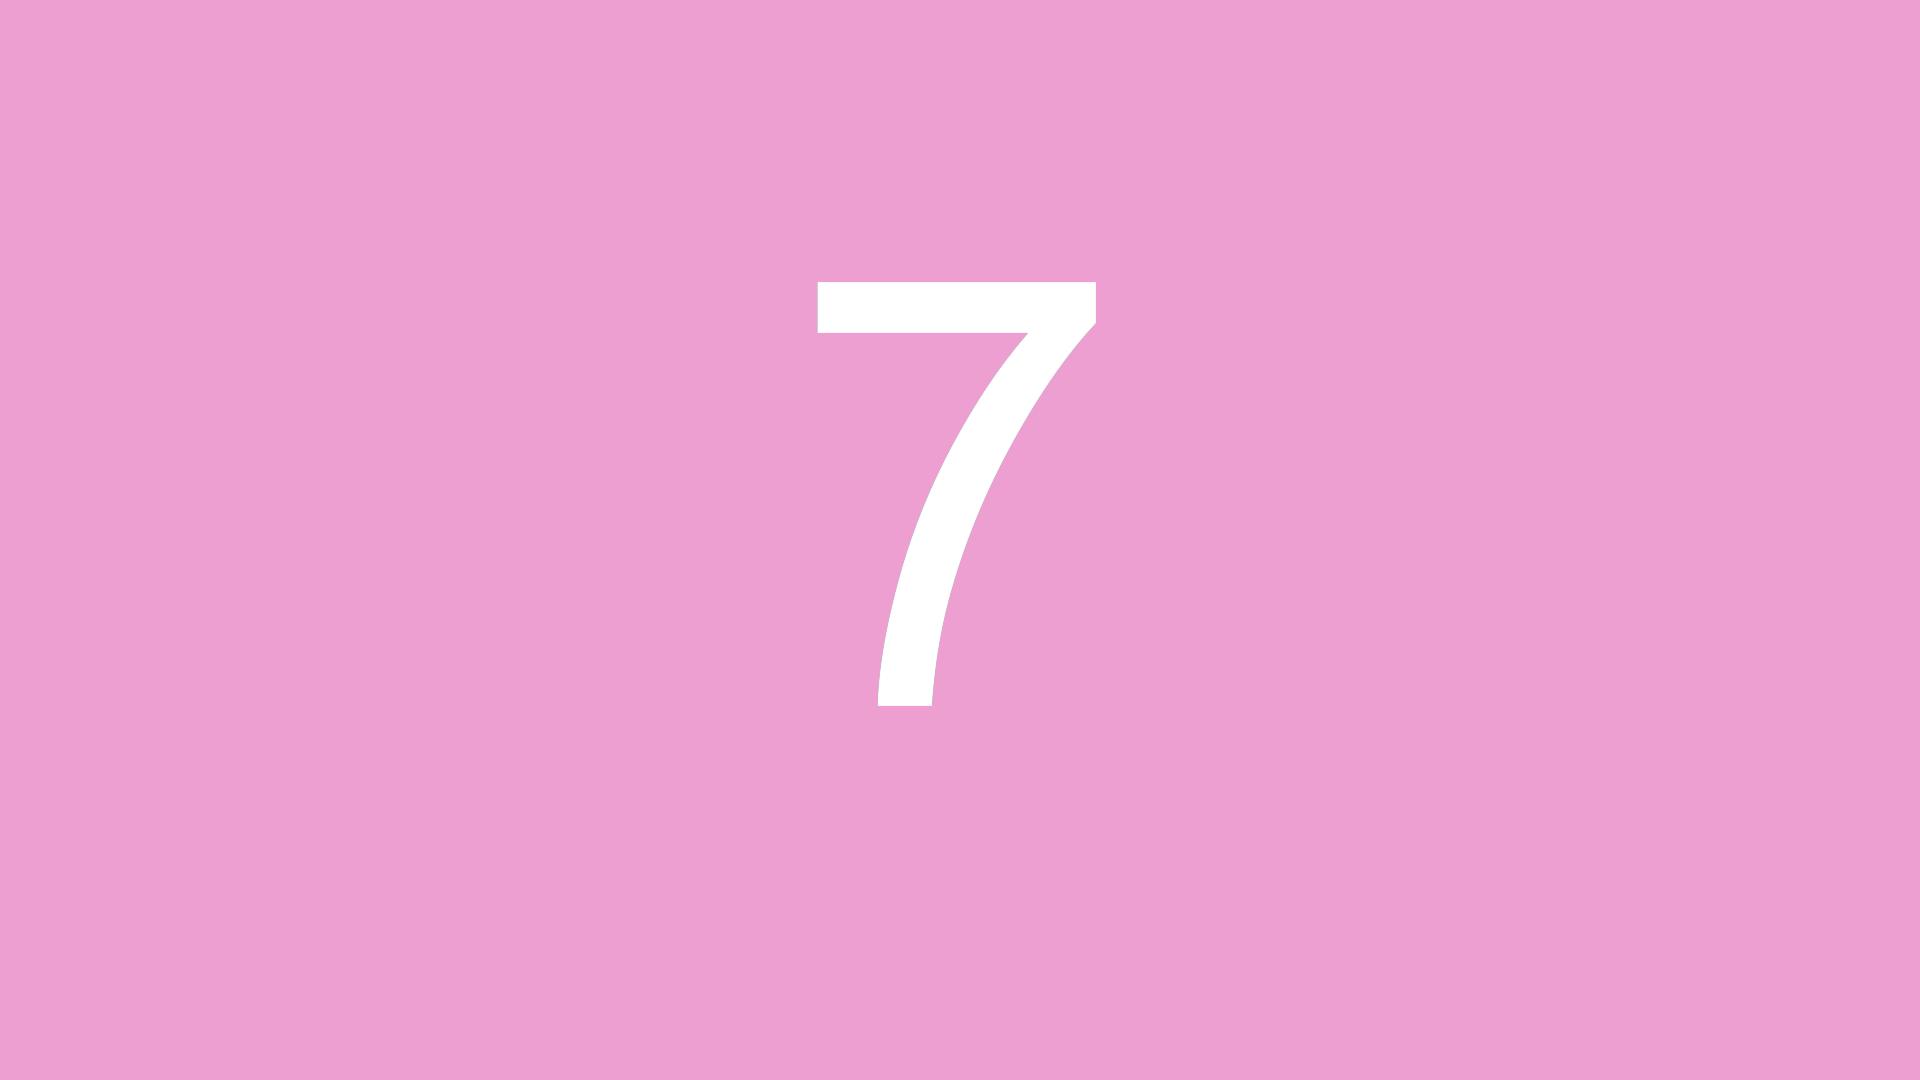 _0066_Pink_07